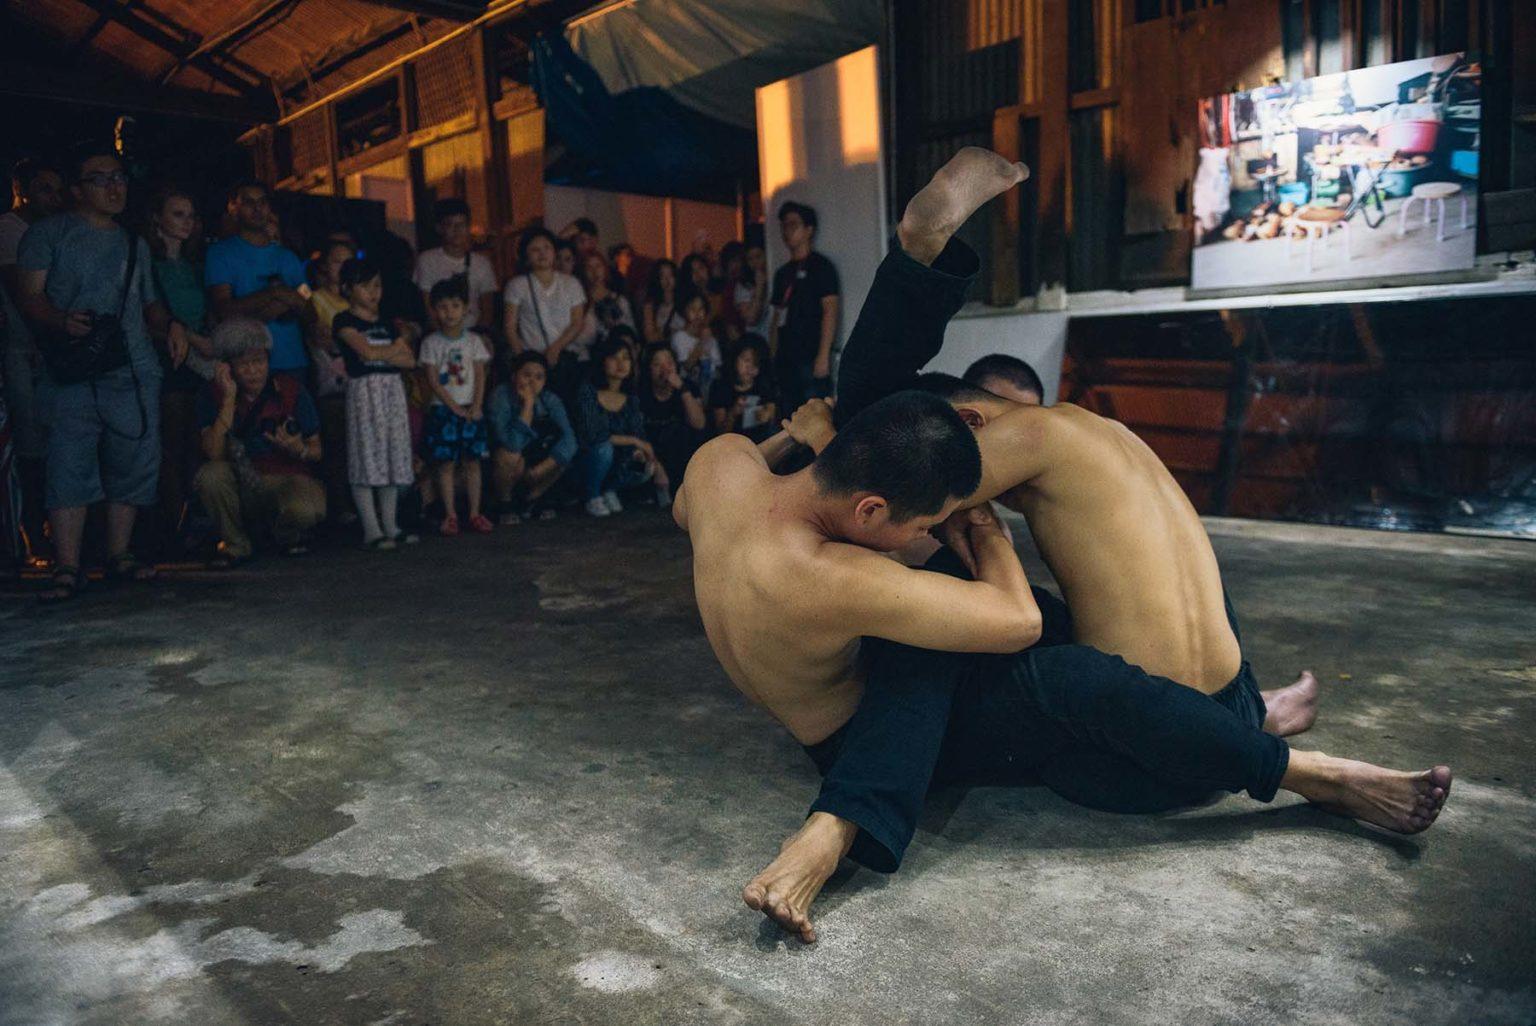 DSC_5147_YMOI_BFF_Dancepiece Shou by Beh Chin Lau_exhibition Silent Witness by Claudia den Boer_foto Thum Chia Chieh_2018